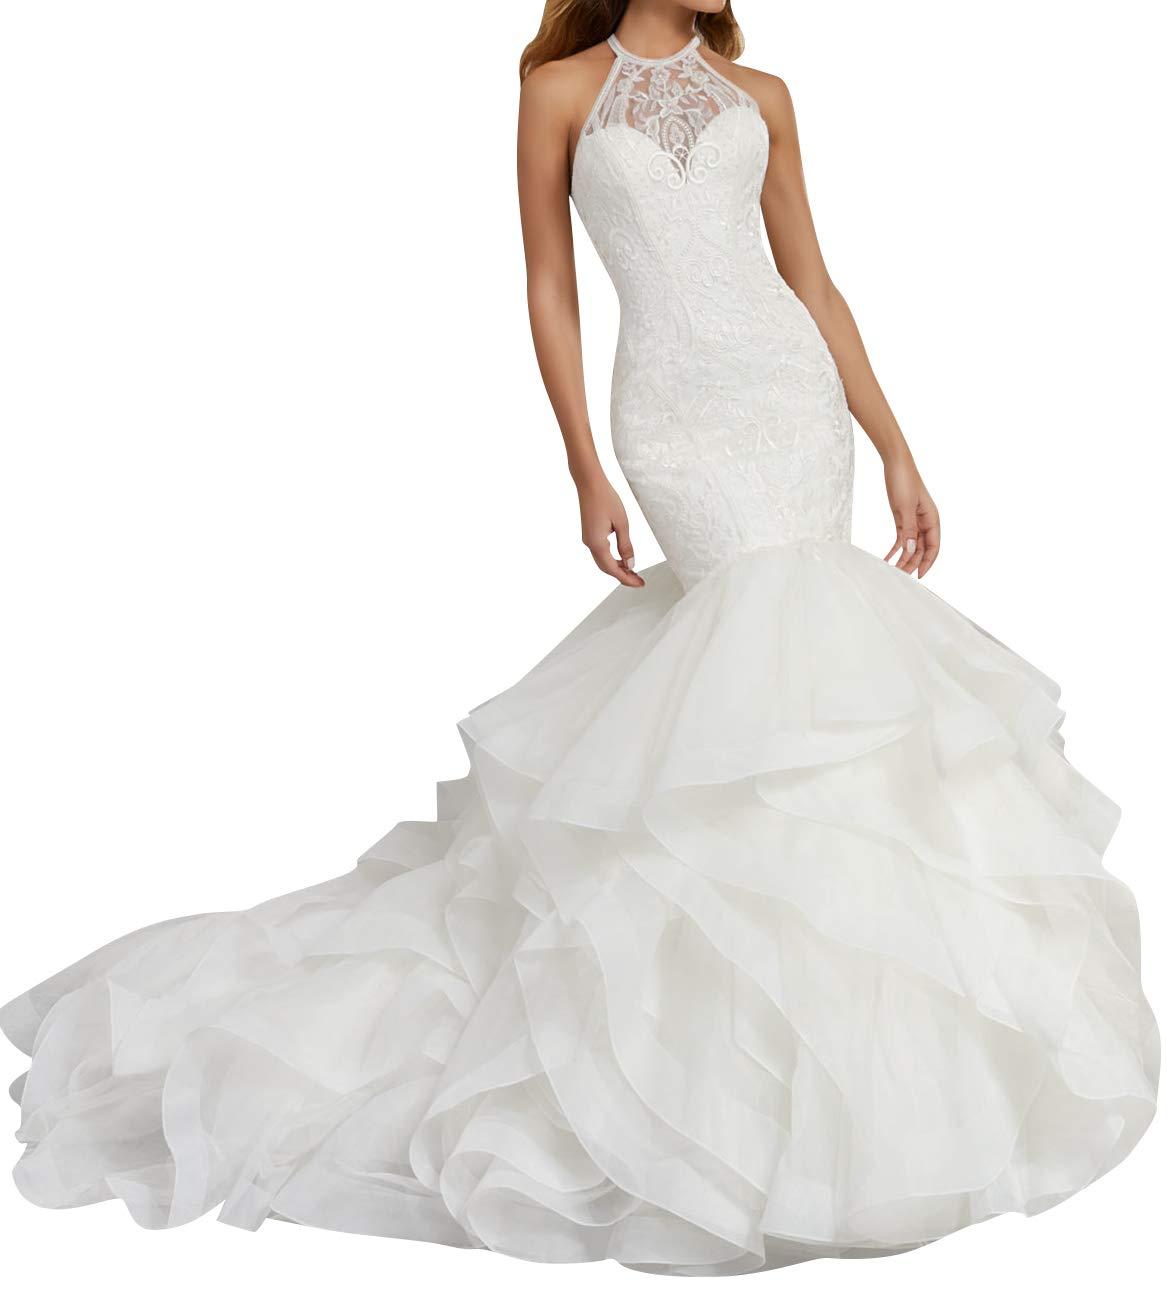 Jaeden Wedding Dress Lace Halter Bride Dresses Mermaid Wedding Gown Trumpet Ruffles